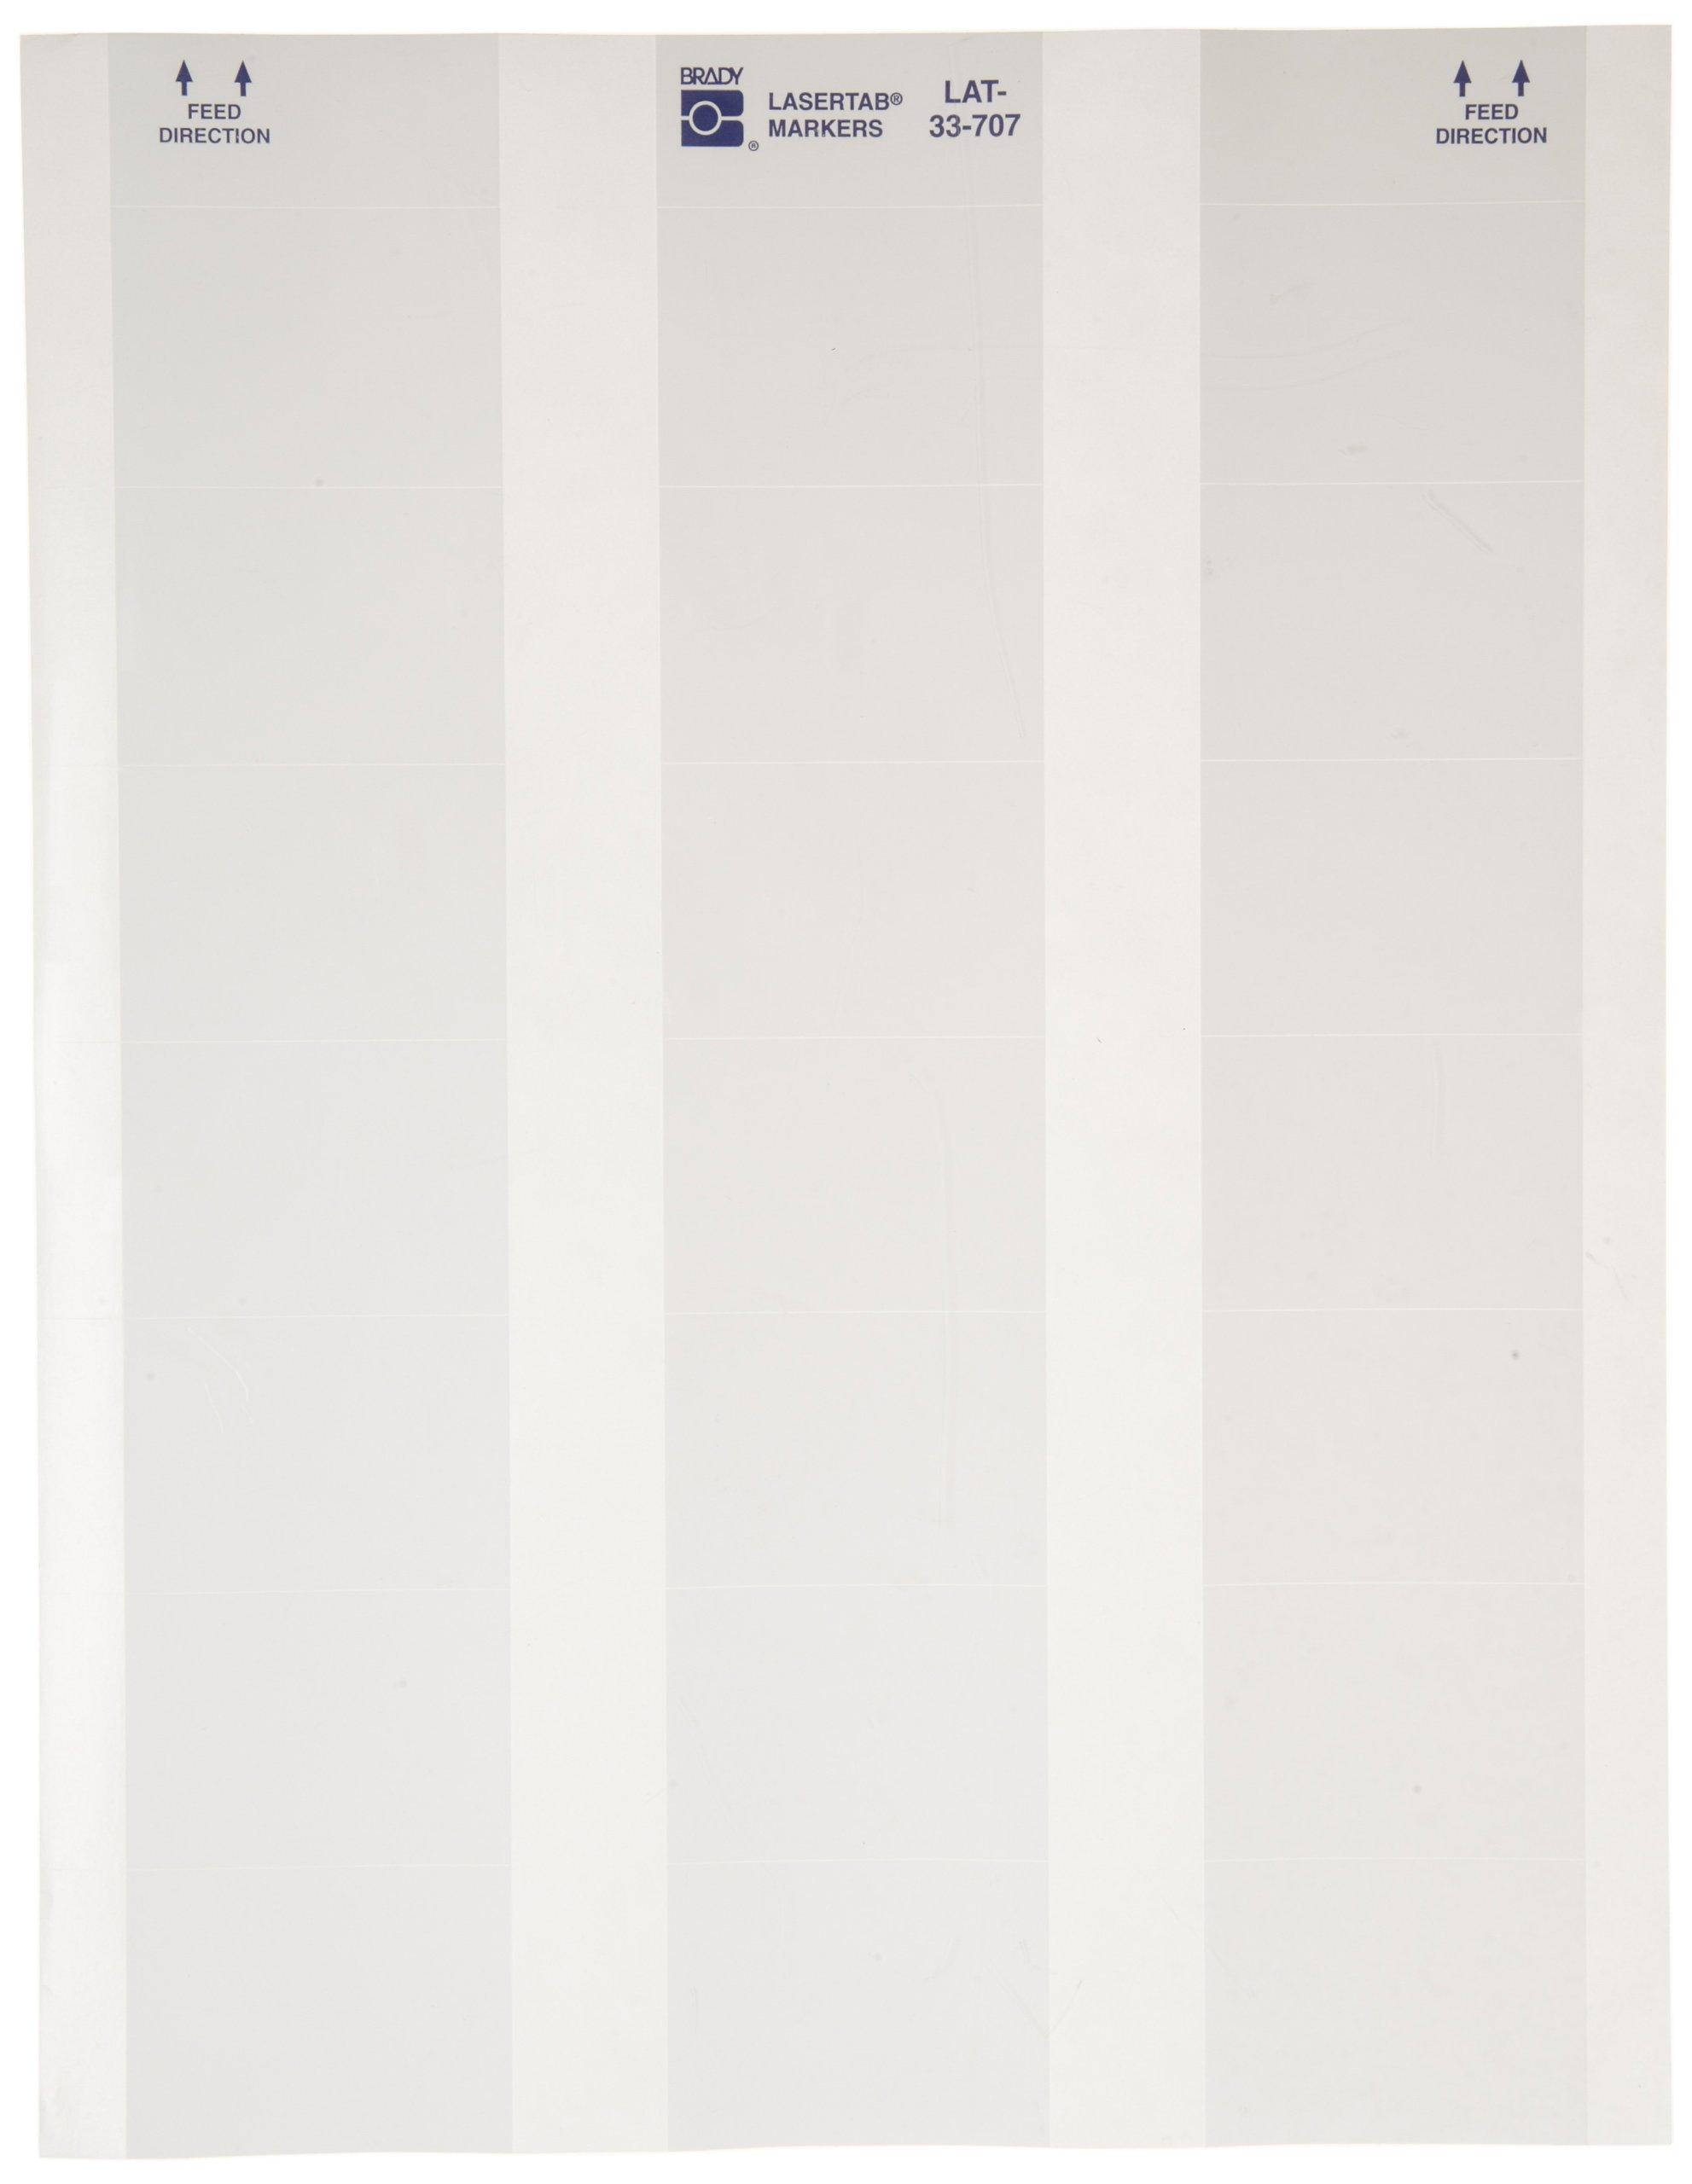 Brady LAT-33-707-1 2'' Width x 1.437'' Height, B-707 Rough Surface Polyester, Matte Finish White Lasertab Laser Printable Label (Pack of 1000)